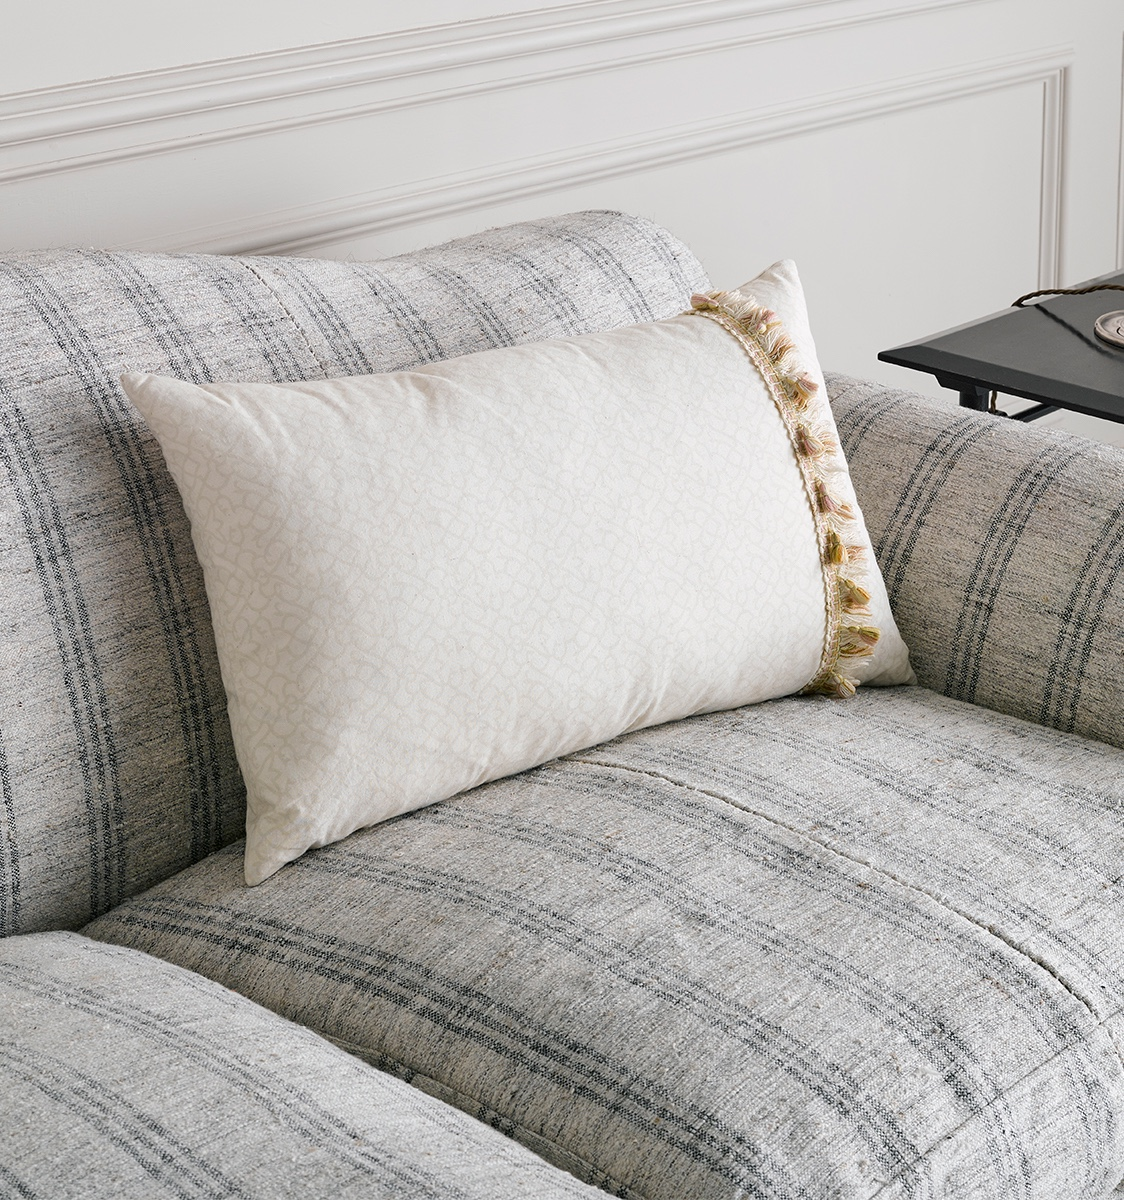 Antique Fabric Cushion with Trim